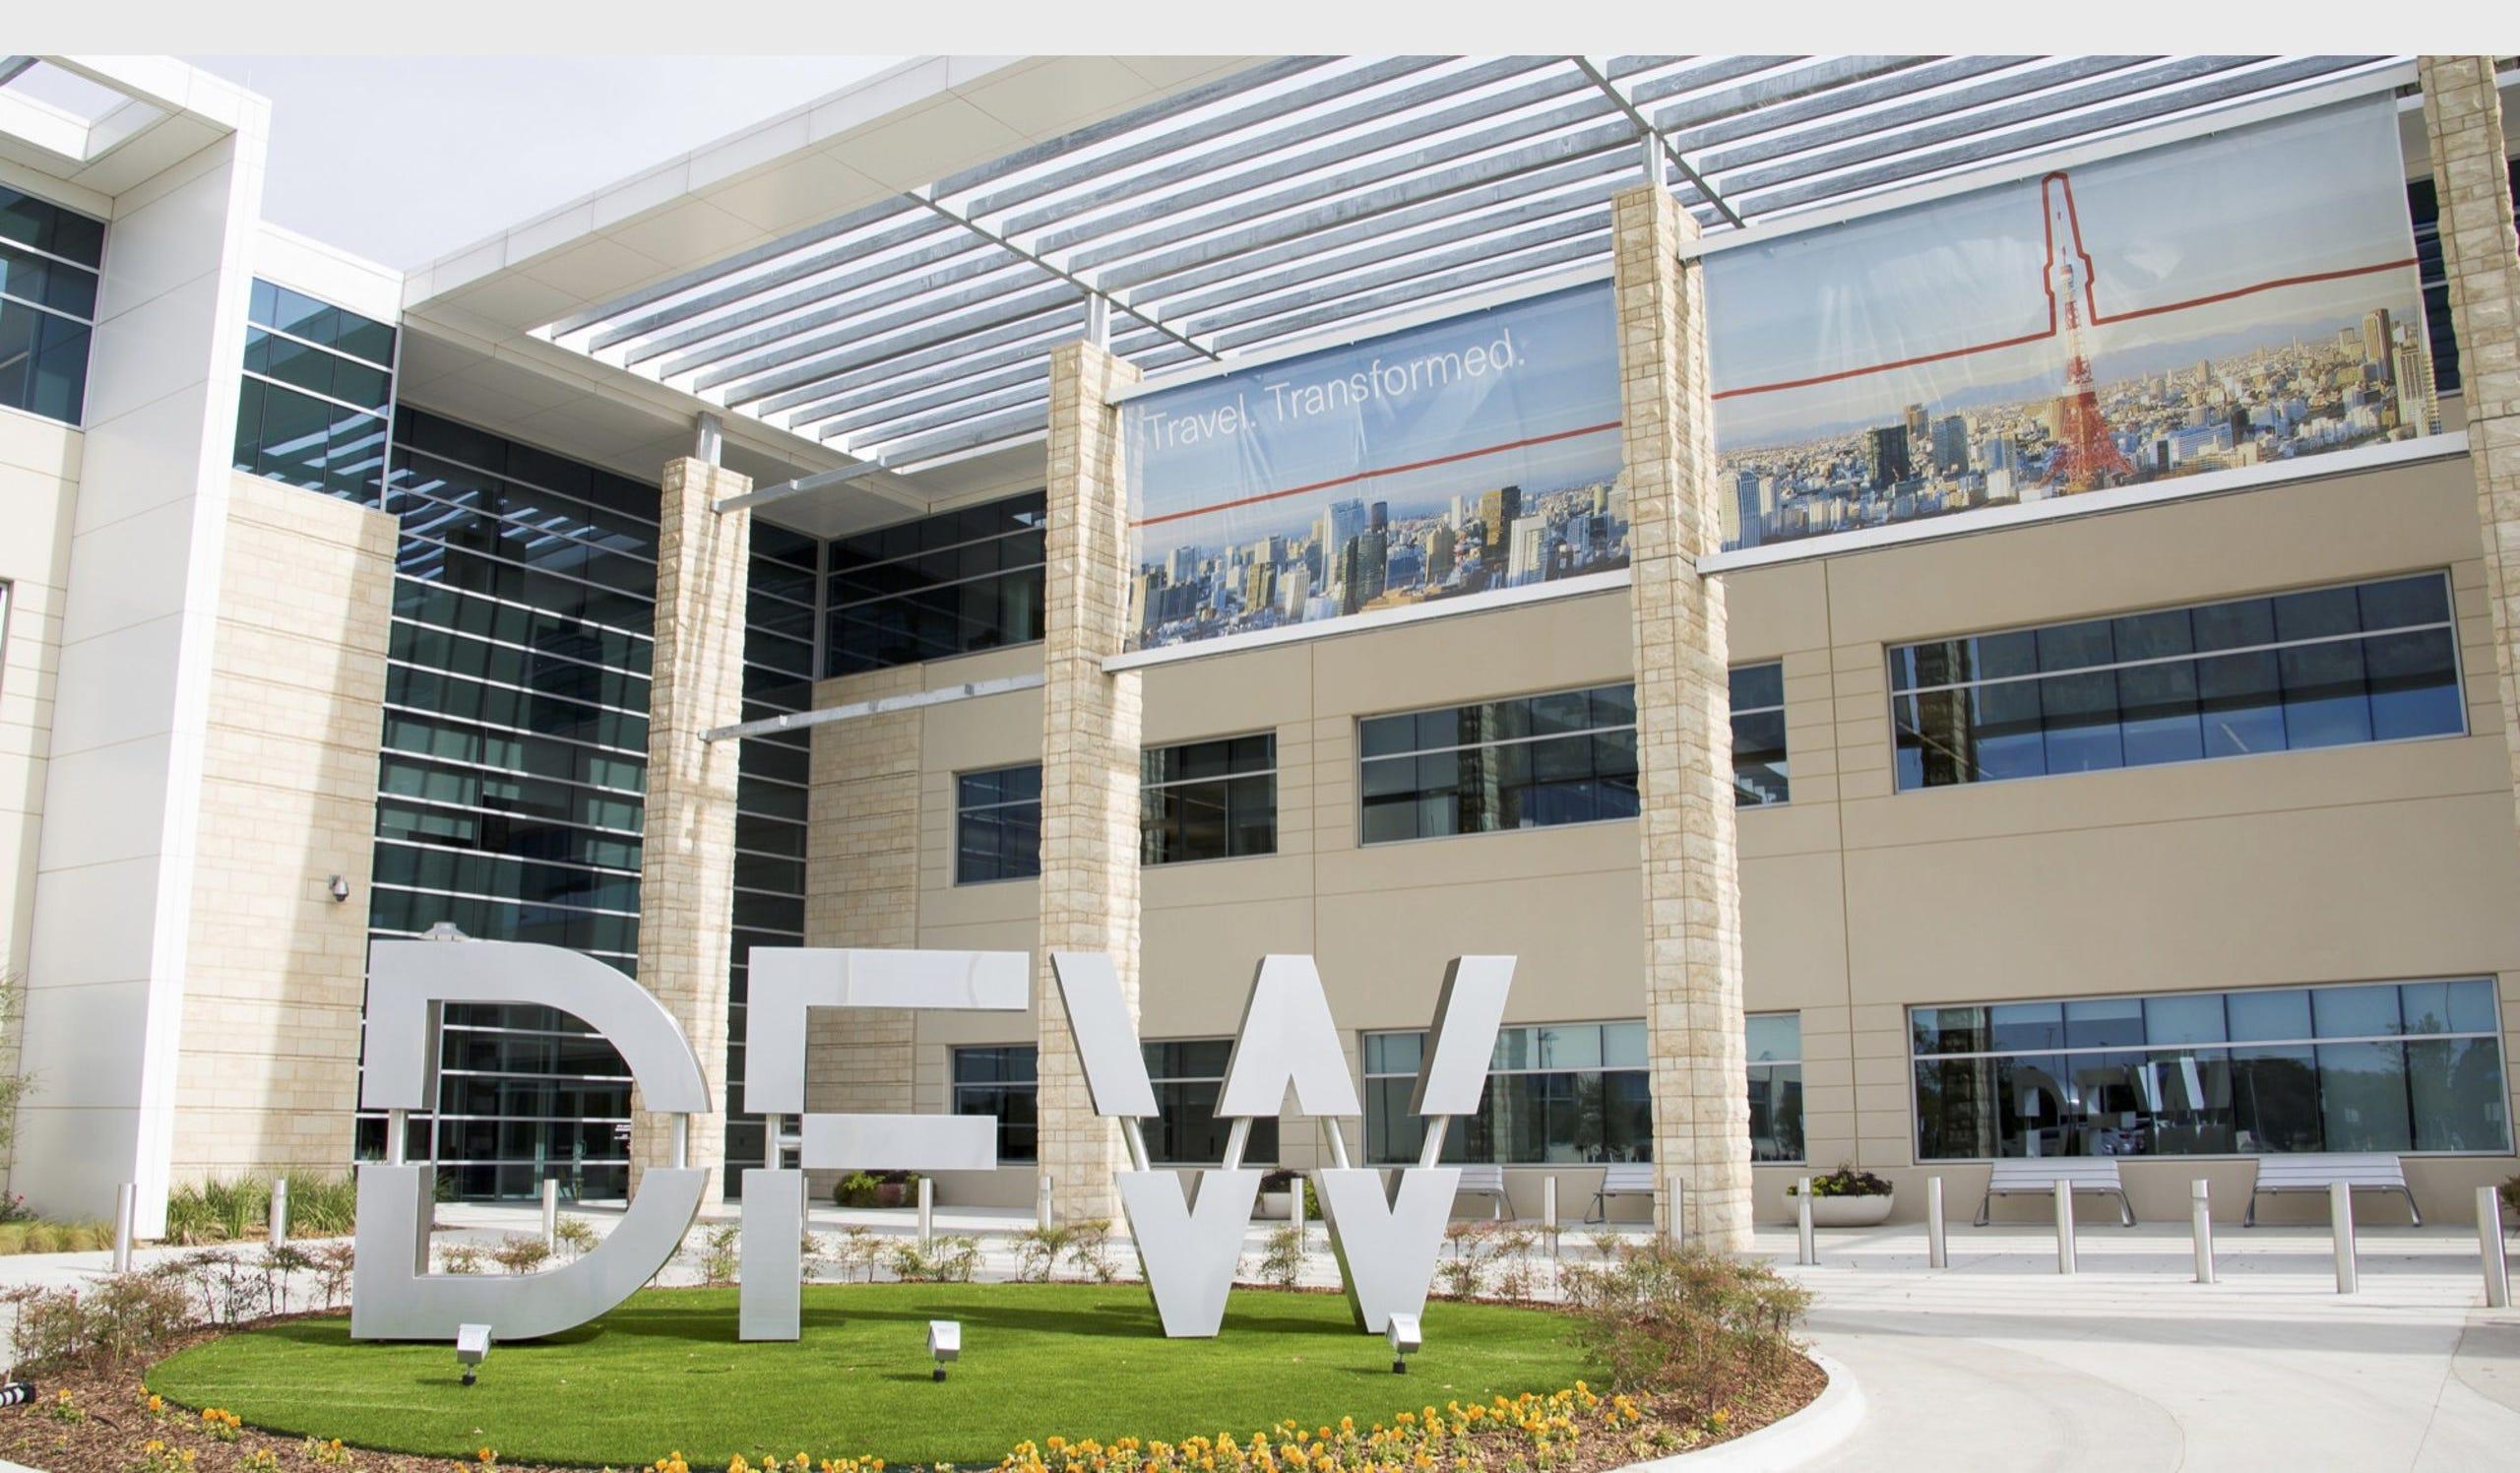 Dallas Fort Worth International Airport (DFW)